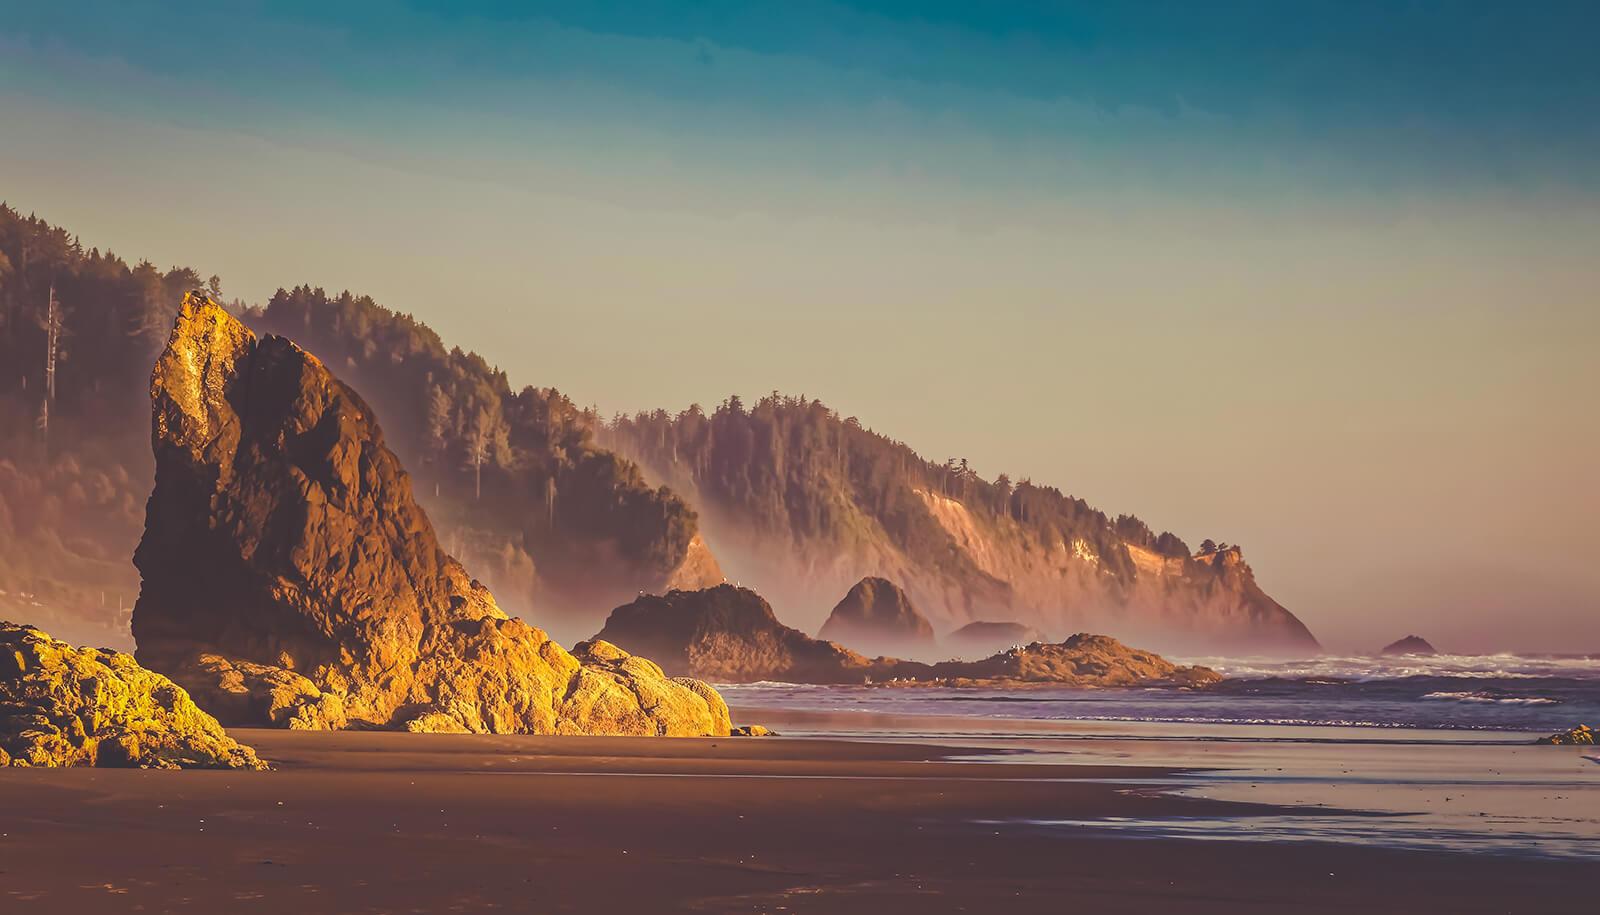 Sunset on the Oregon Coast